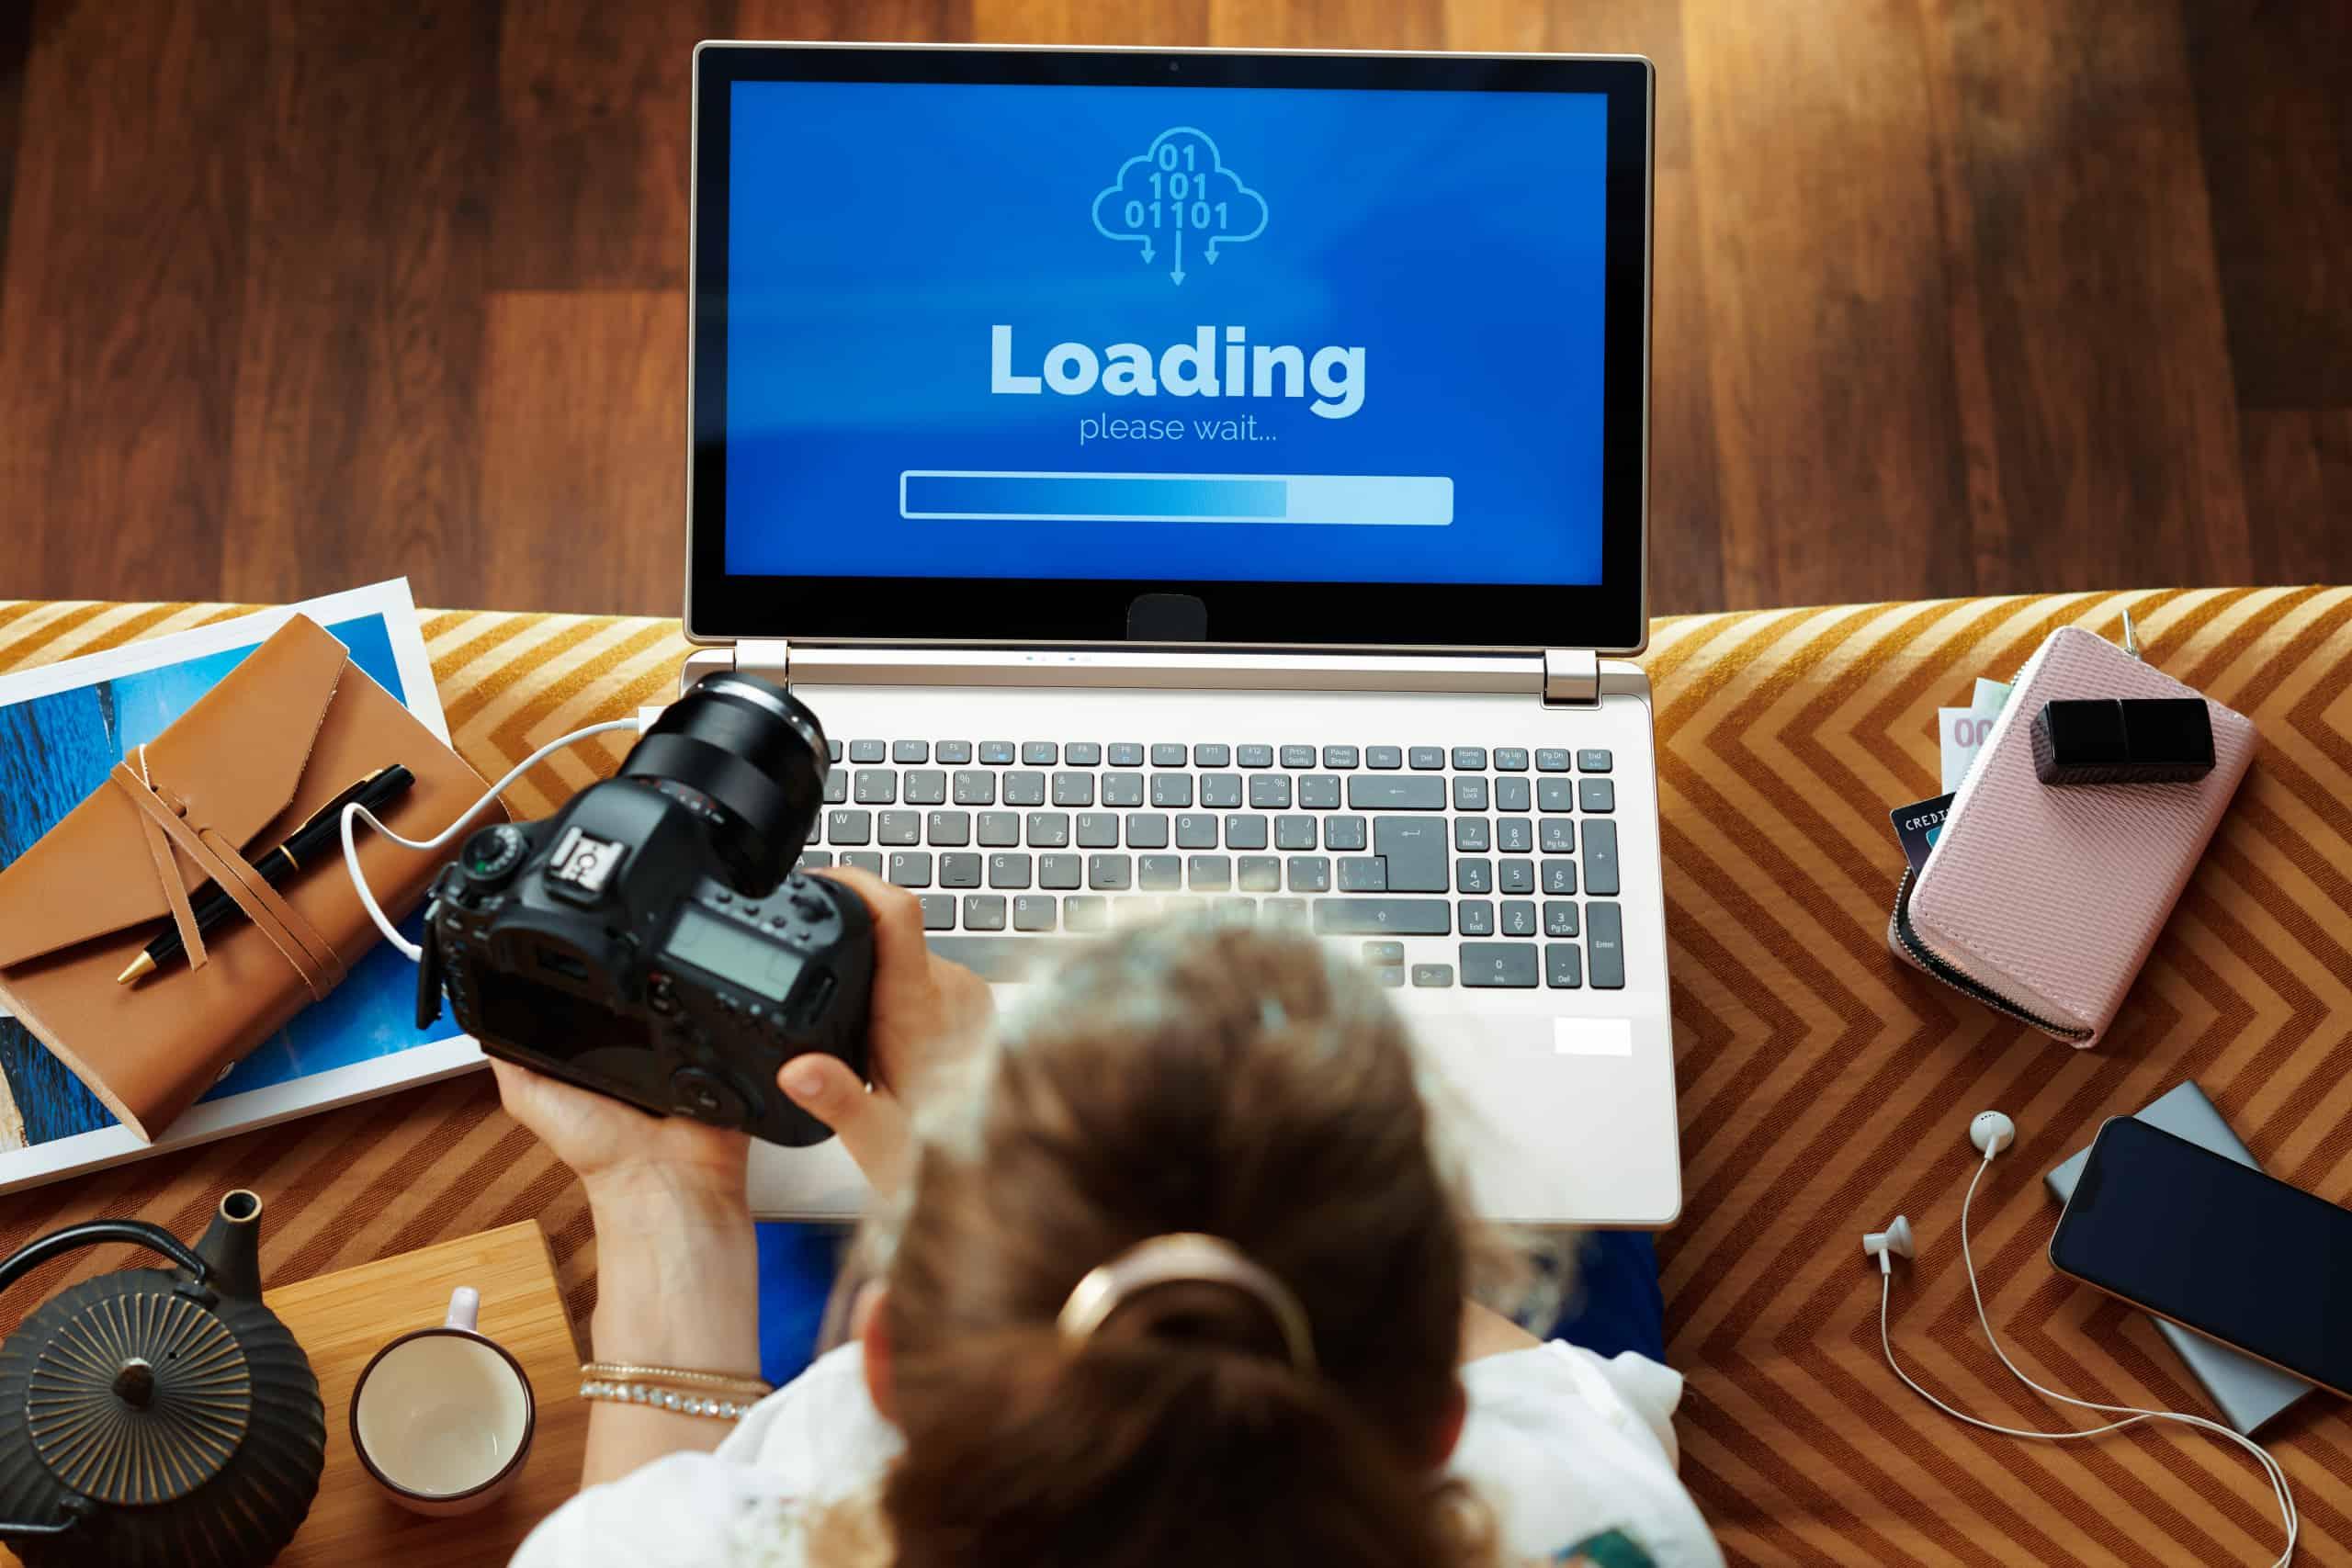 Woman looking at loading screen